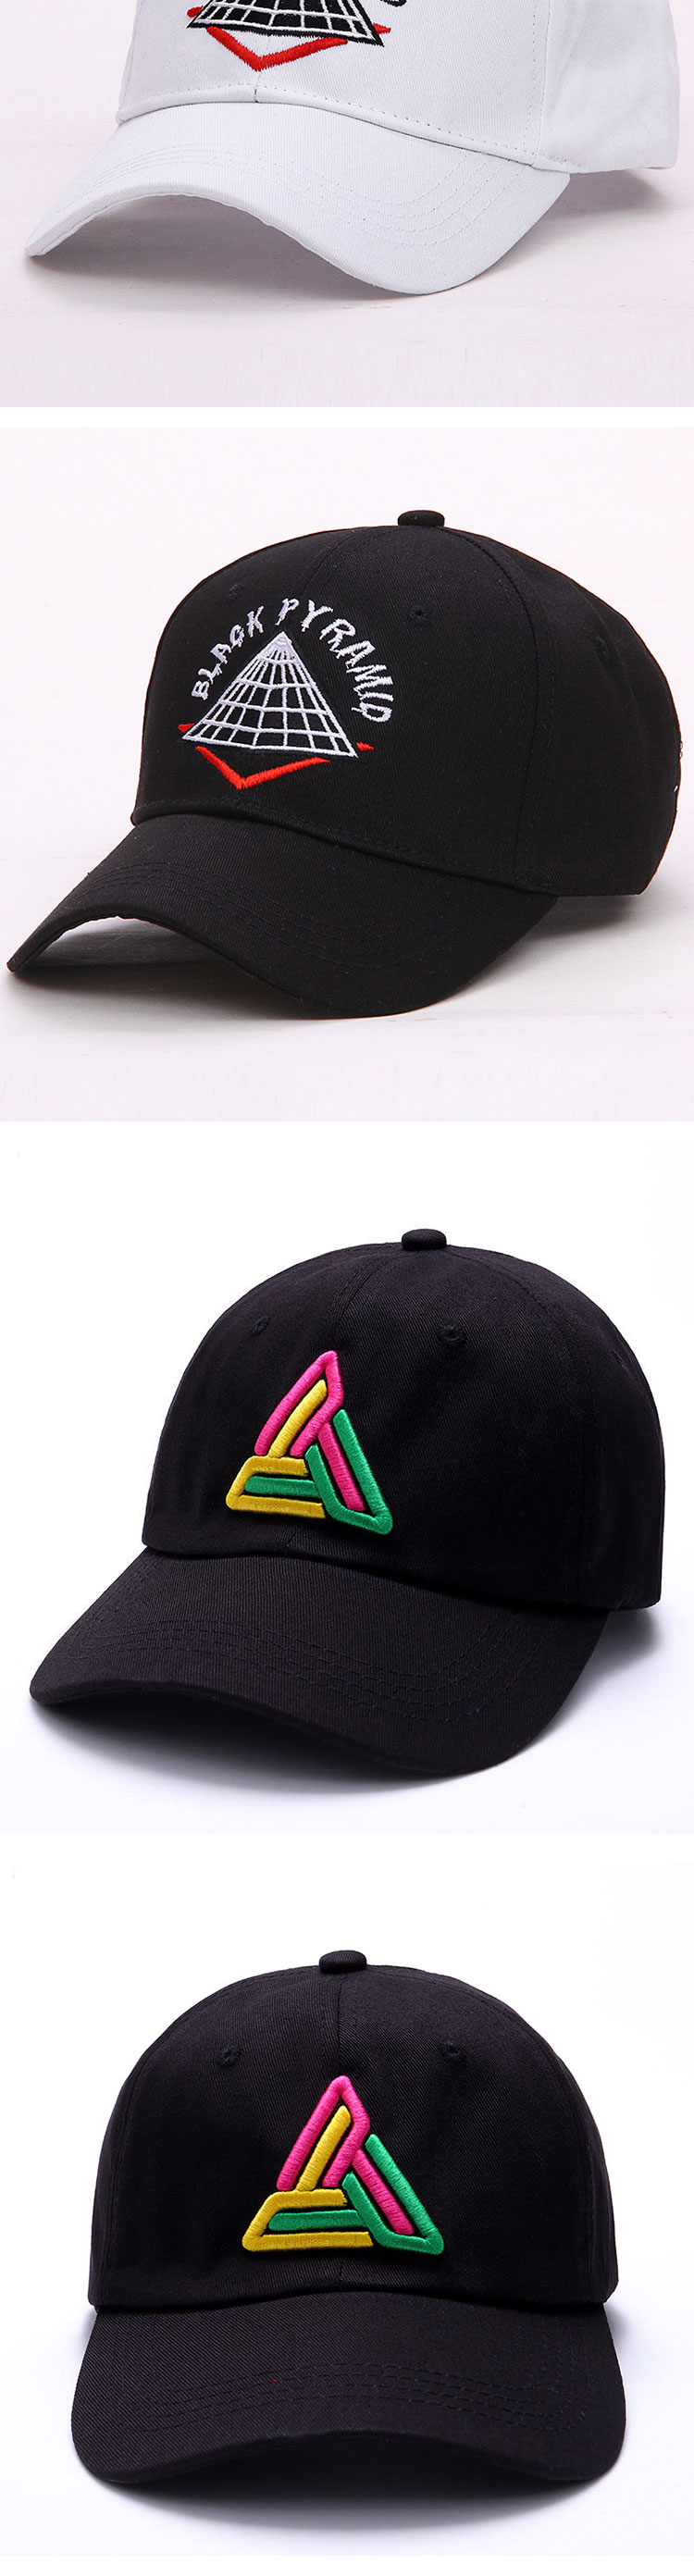 9ad0aa7735c LANHUIFD New Embroidery BLACK PYRAMID Cap Dad Hat Bone Feminino Hip ...